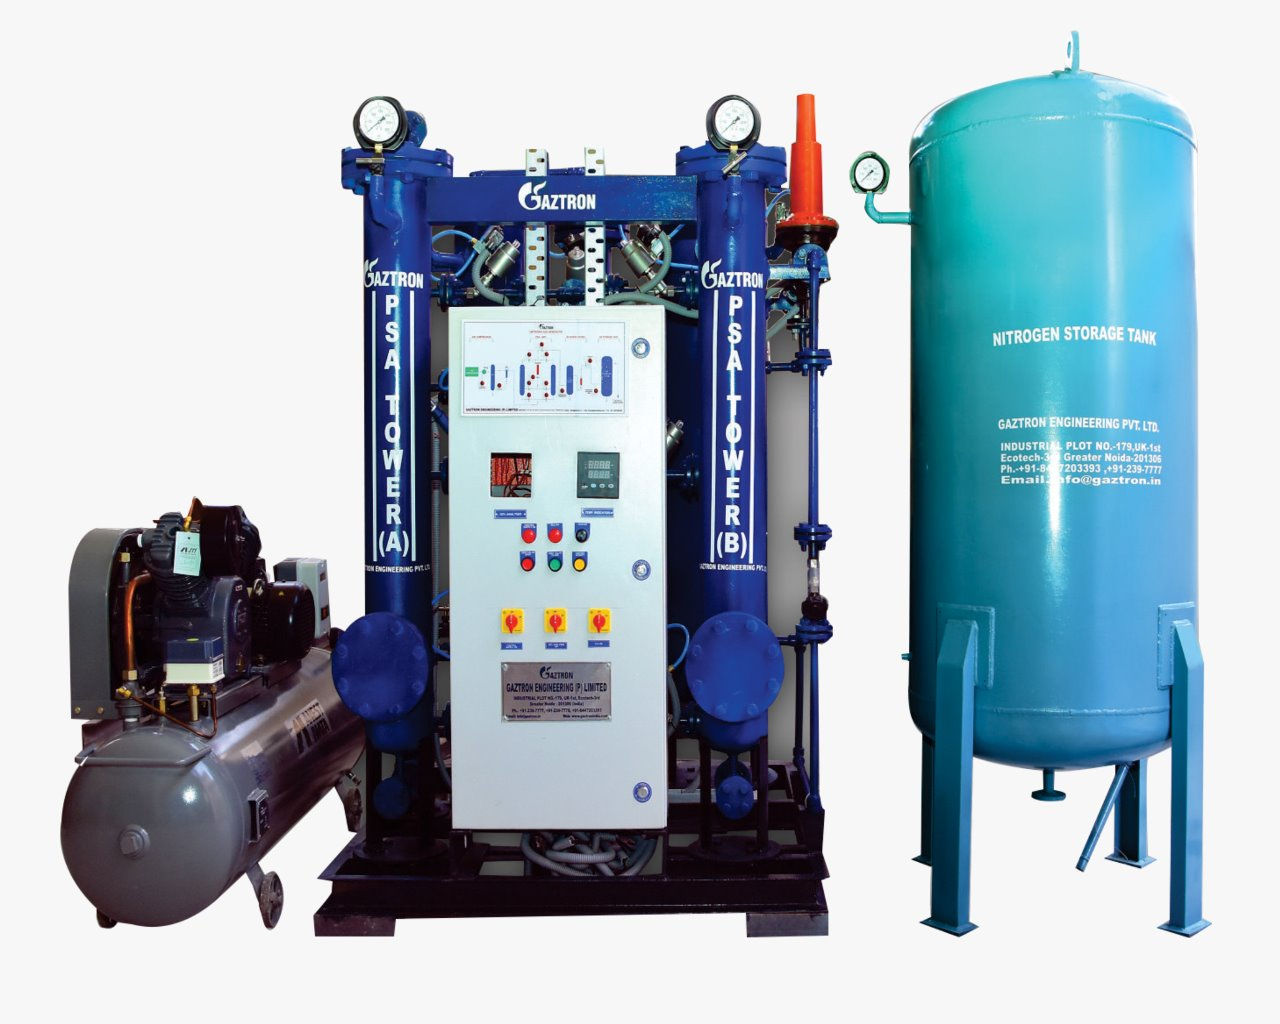 PSA Nitrogen Gas Generator for Bright Annealing